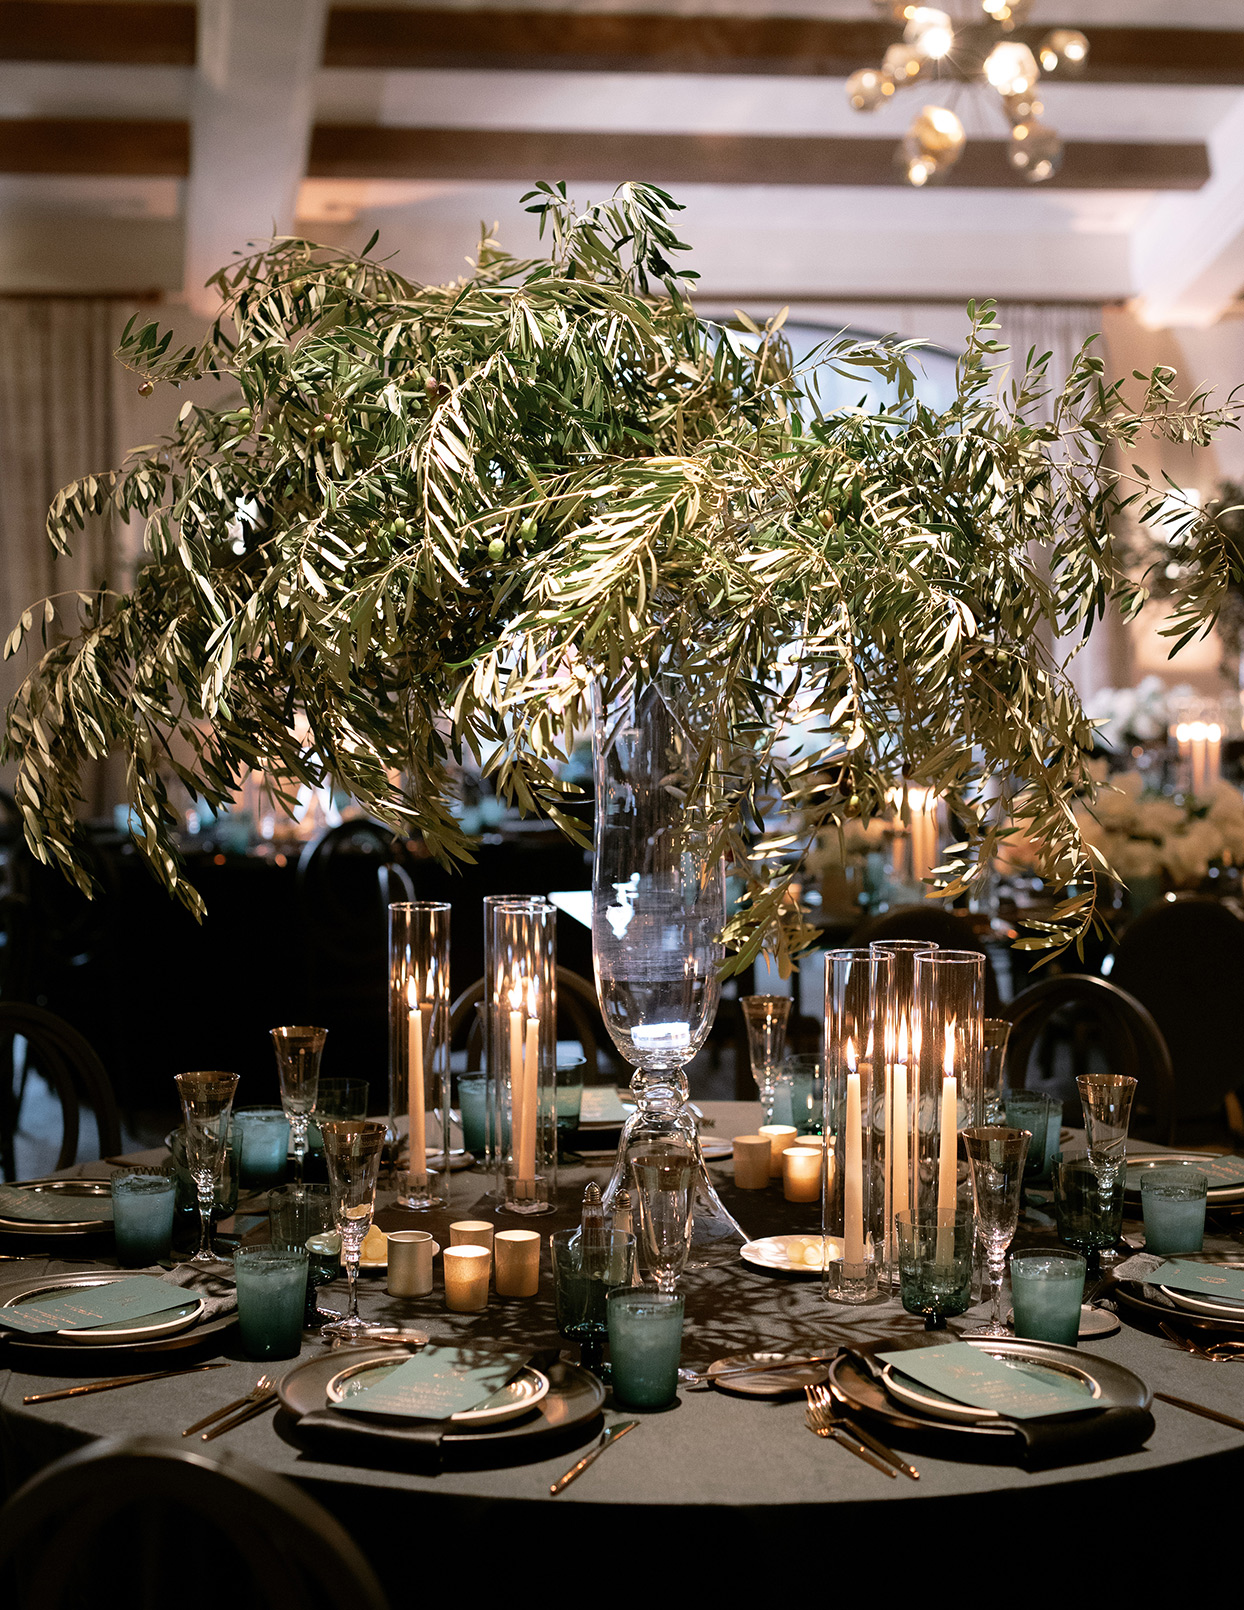 jason justin wedding reception dark tablescape with large greenery centerpiece